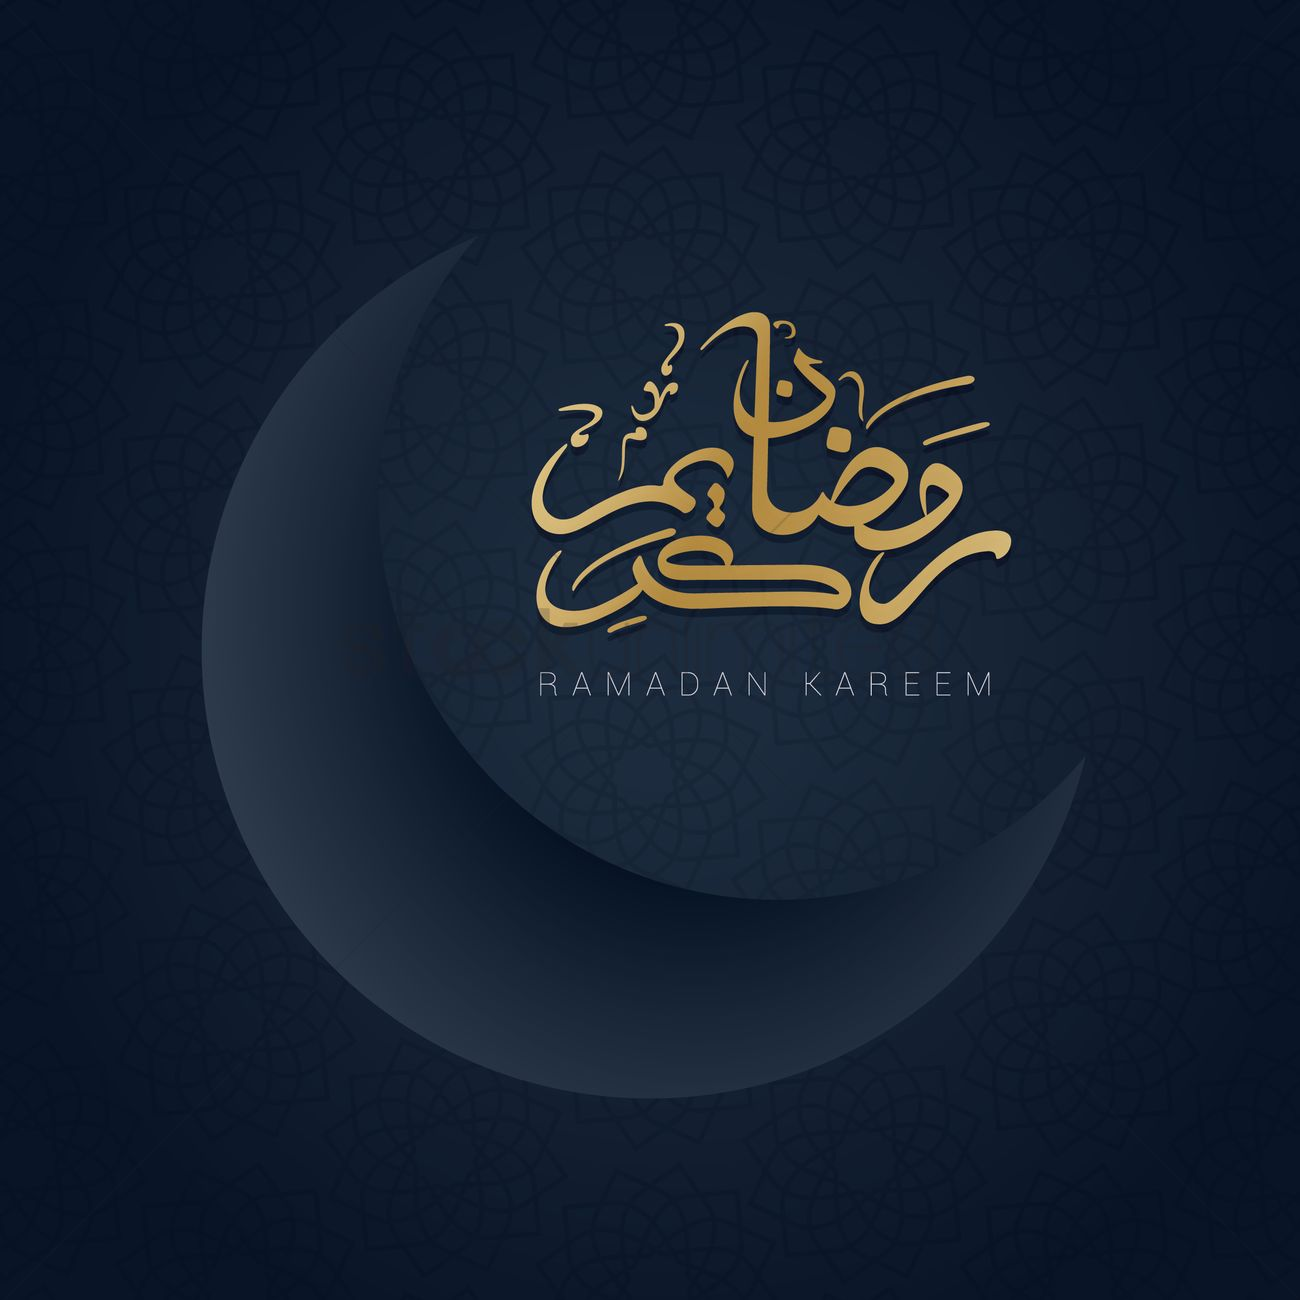 Ramadan Kareem Greeting In Jawi Vector Image 1826879 Stockunlimited